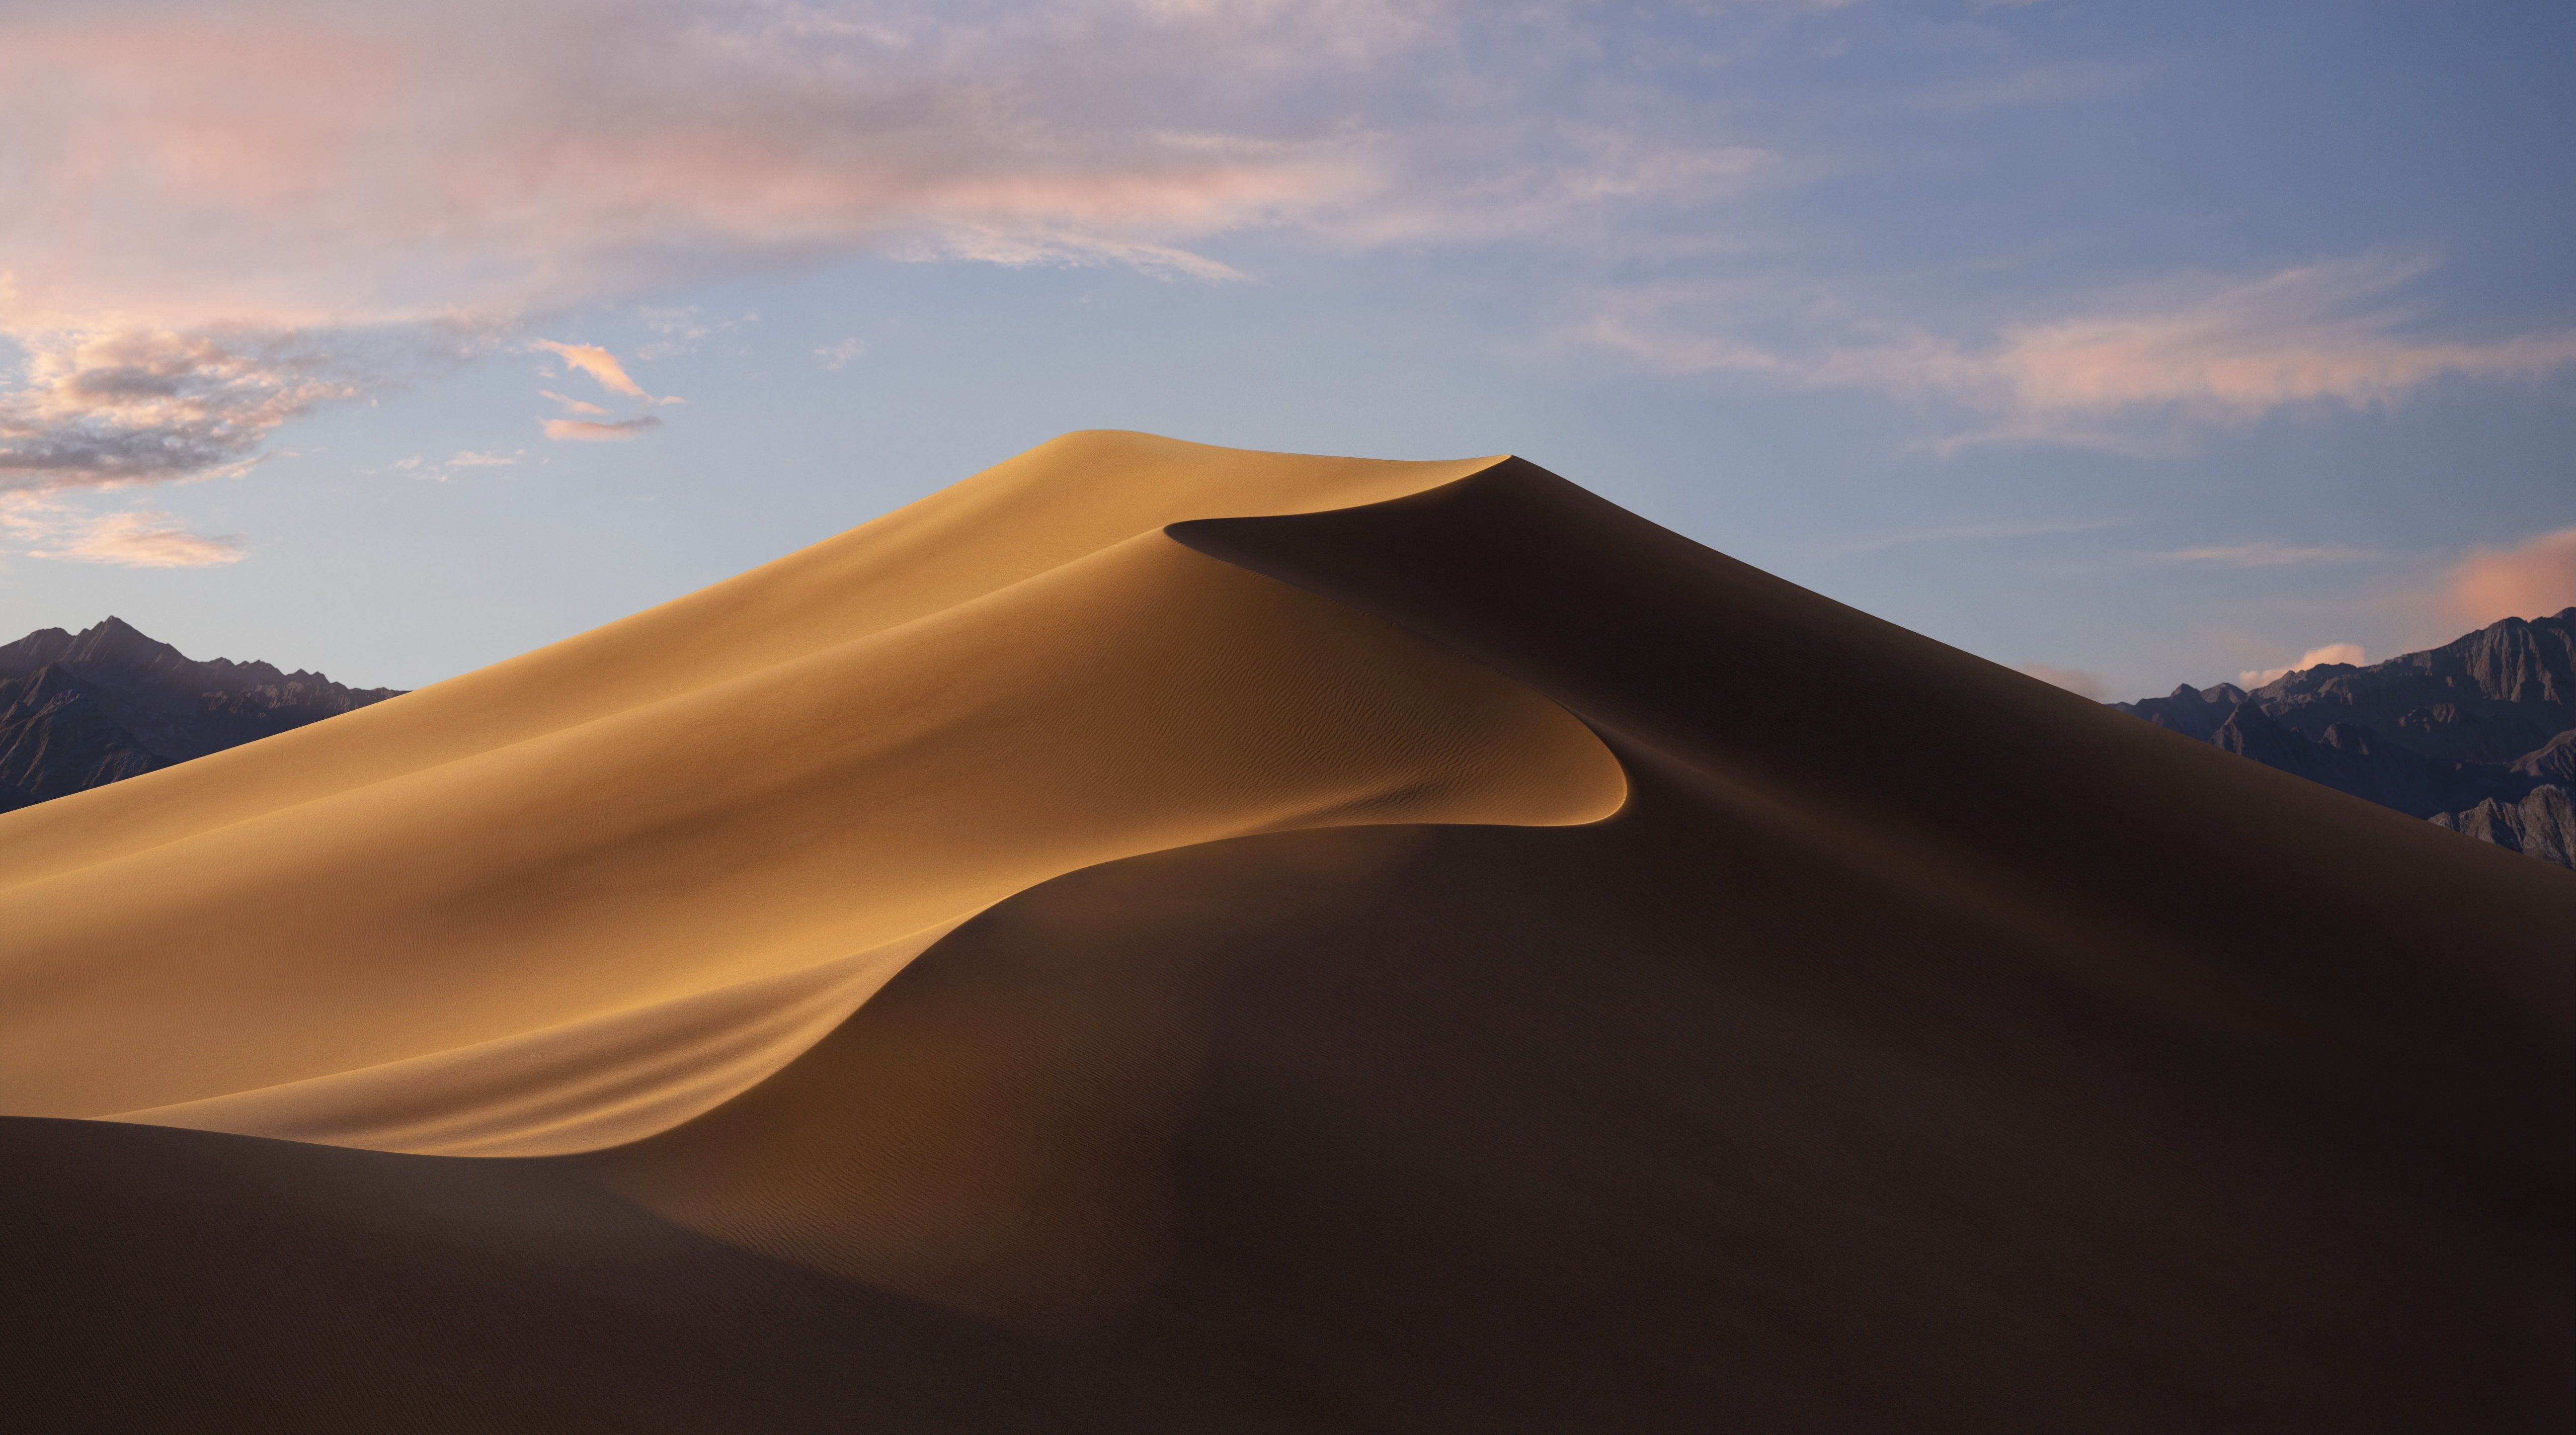 Macos Mojave Day Sand Dunes Computers Mac Apple Mac Macos Mojave Desert 5k Wallpaper Hdwallpaper De In 2020 Macbook Pro Wallpaper Macbook Pro Mac Wallpaper